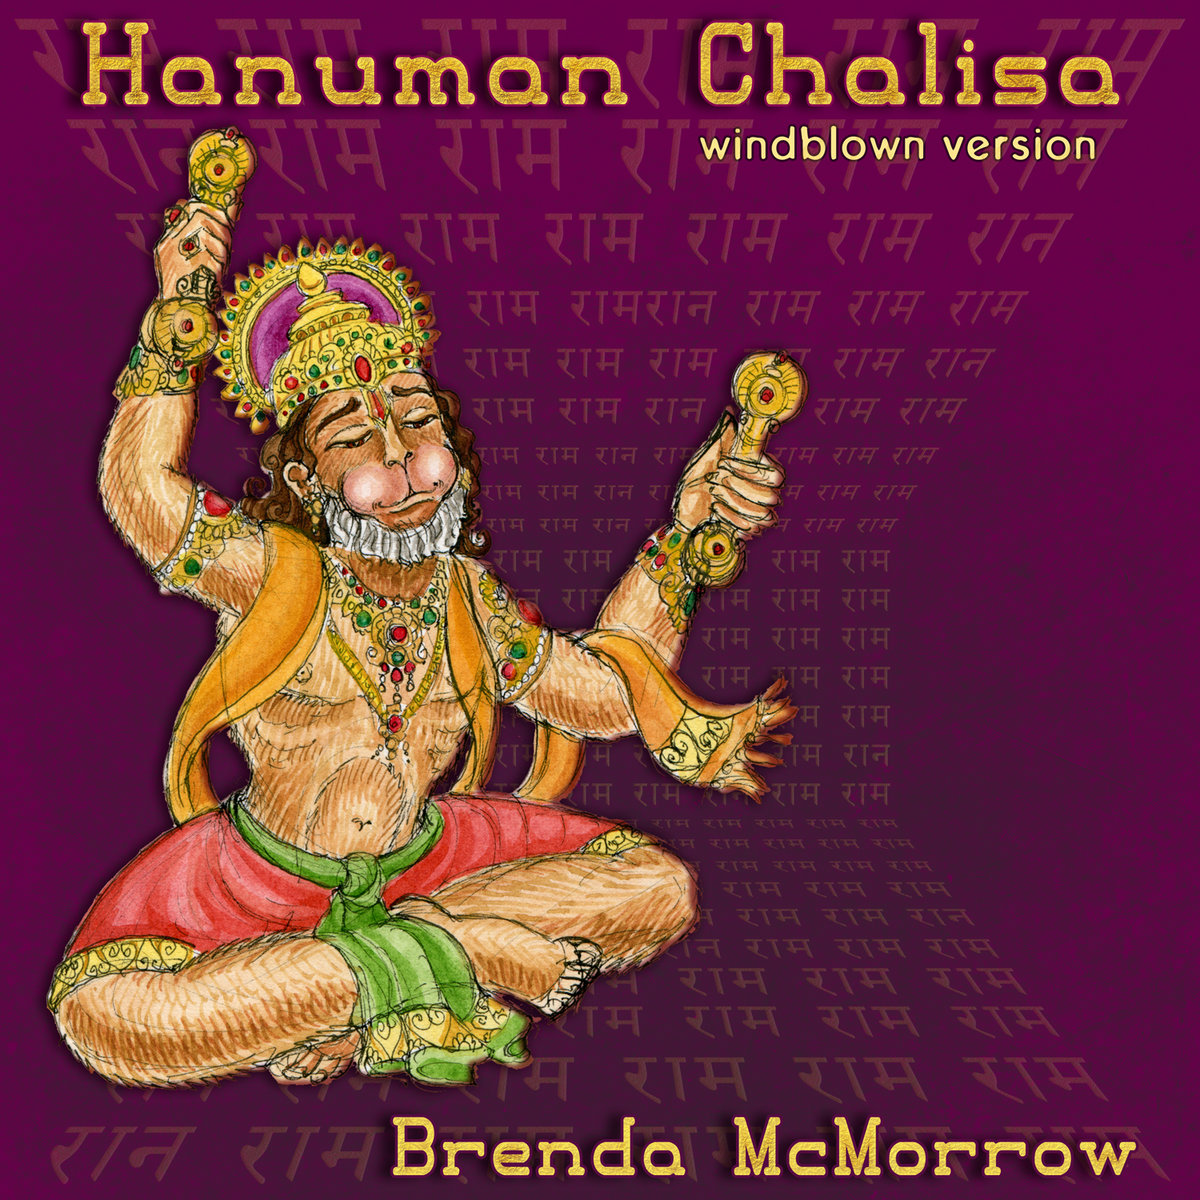 Hanuman Chalisa (Windblown Version) | White Swan Records